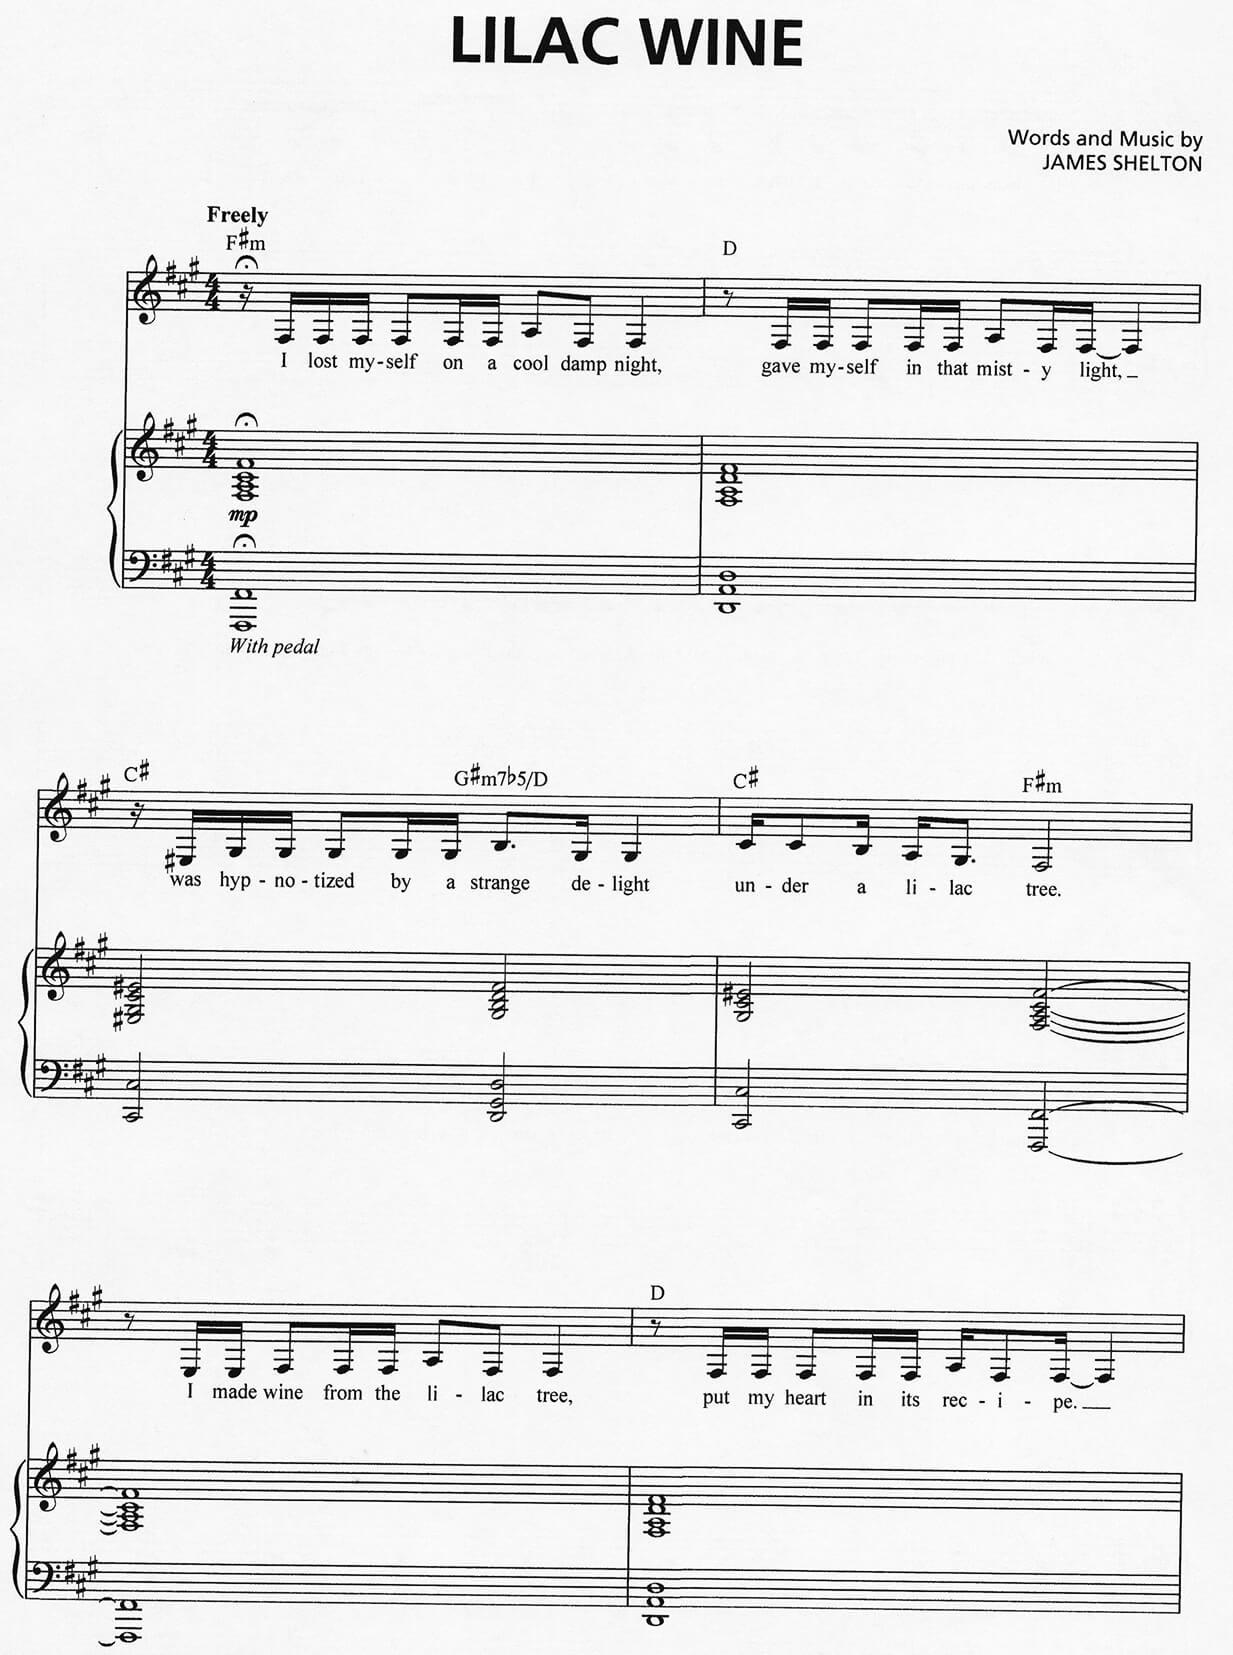 lilacwinesheetmusic1.jpg